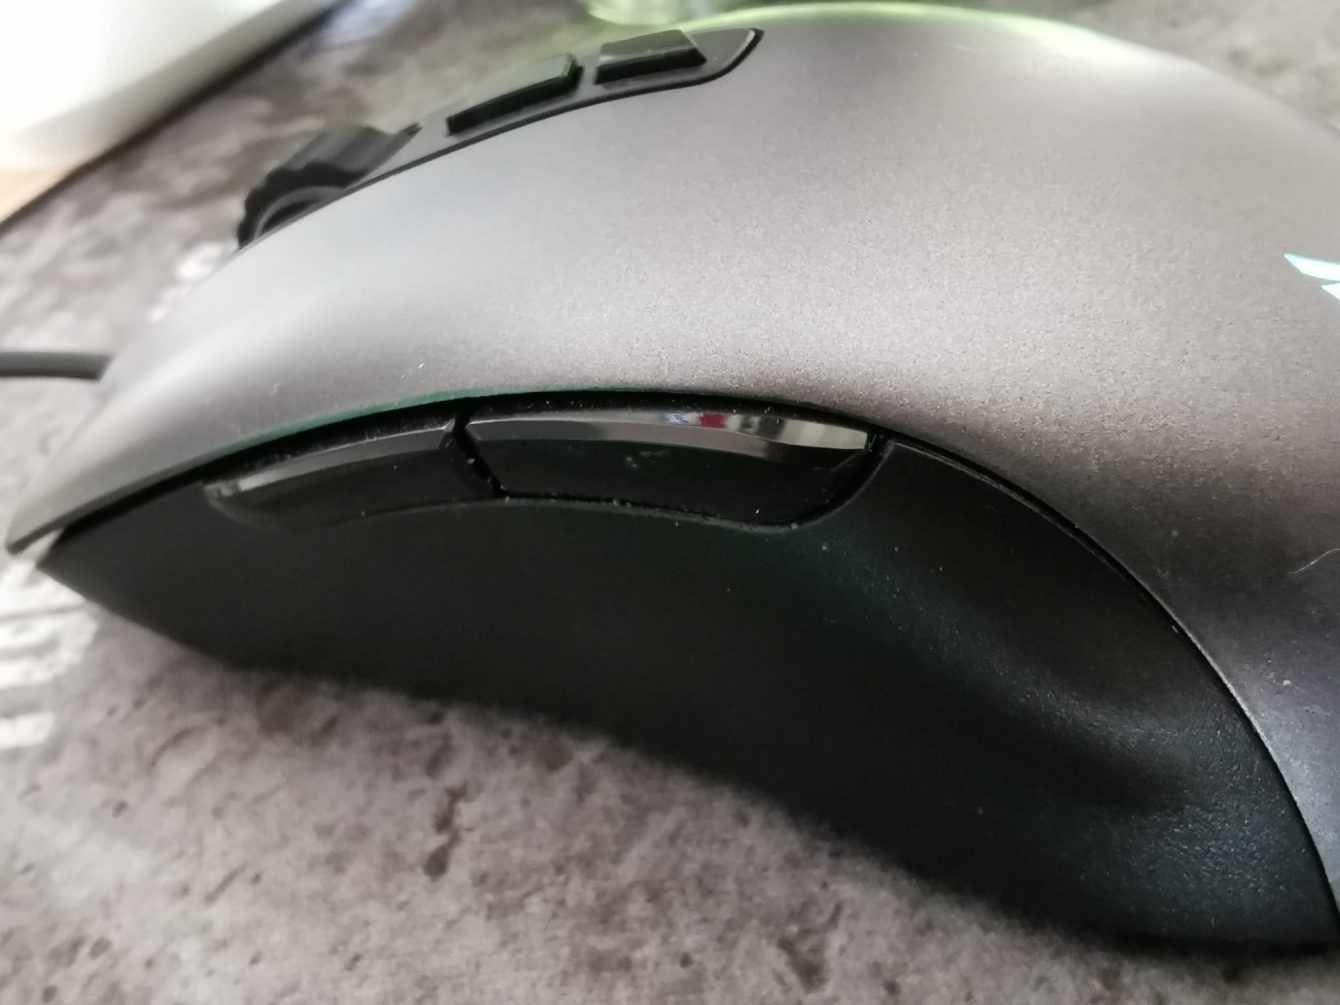 Recensione ASUS TUF Gaming M3 e TUF Gaming P3: mouse e mouse pad per novizi